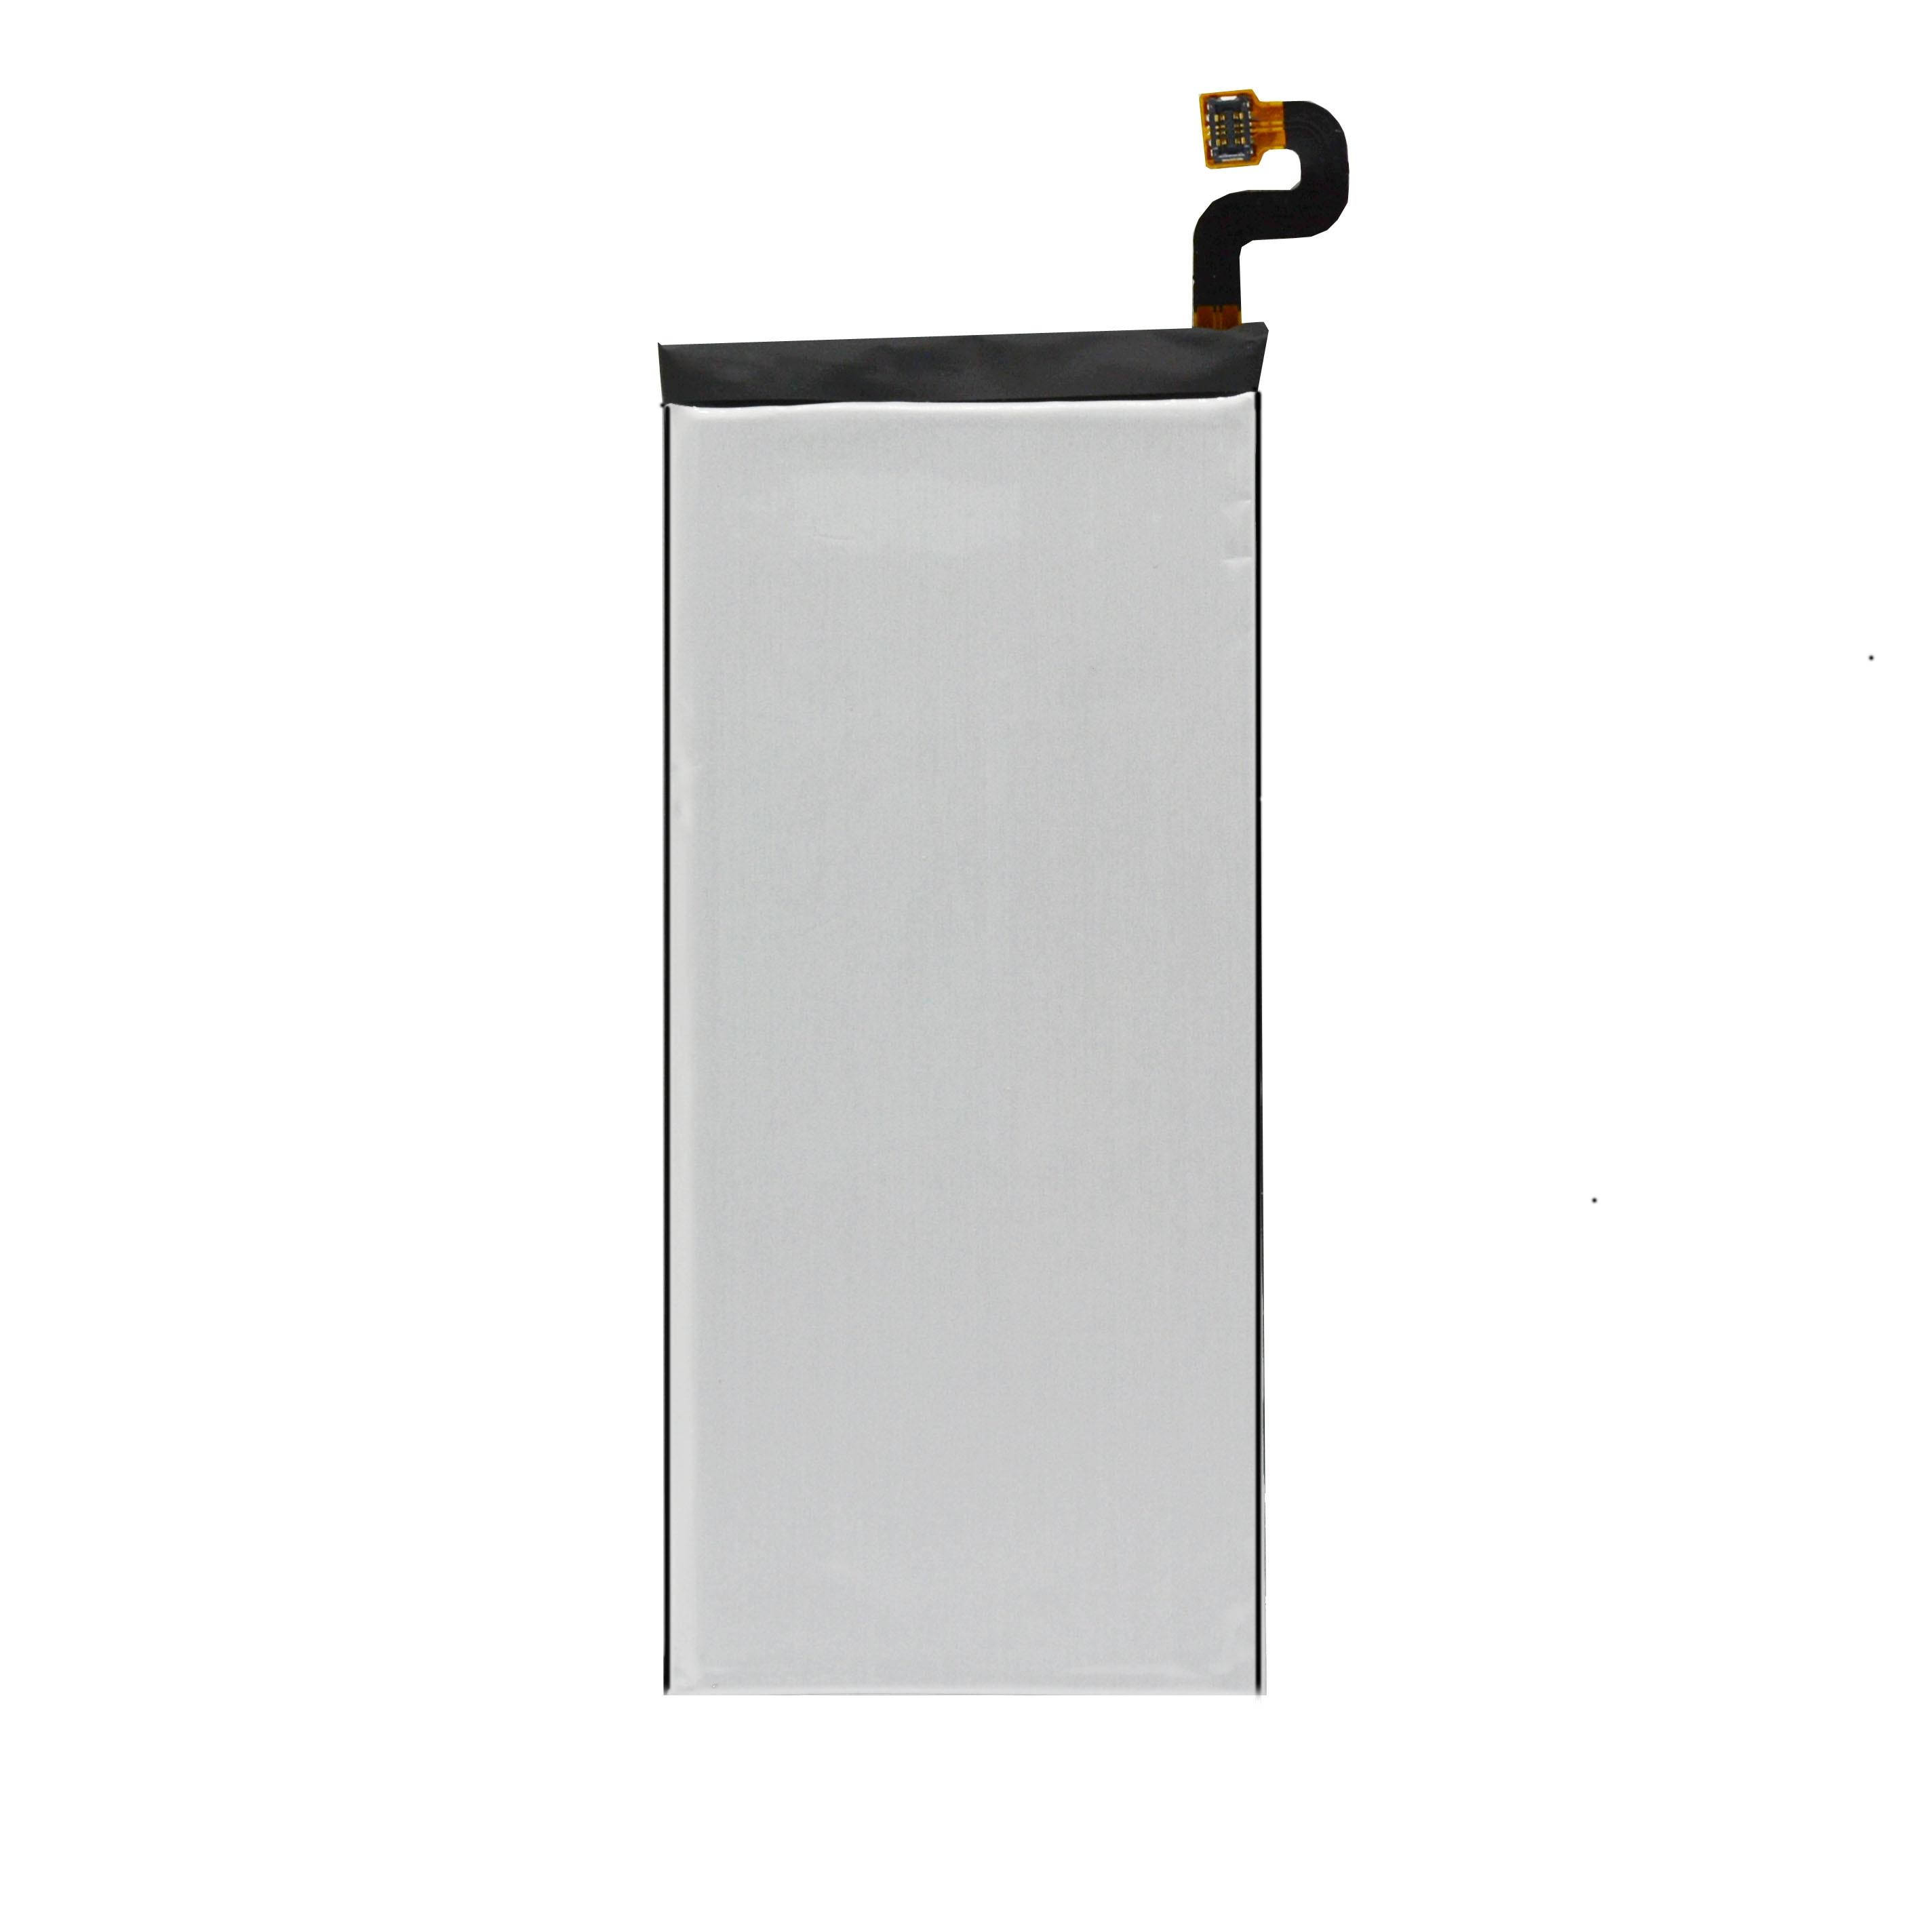 20pcs/lot Original Battery EB-BG930ABE For Samsung galaxy S7 G9300 G930F G930A G9308 SM-G9300 Mobile Phone Bateria 3000mAh enlarge